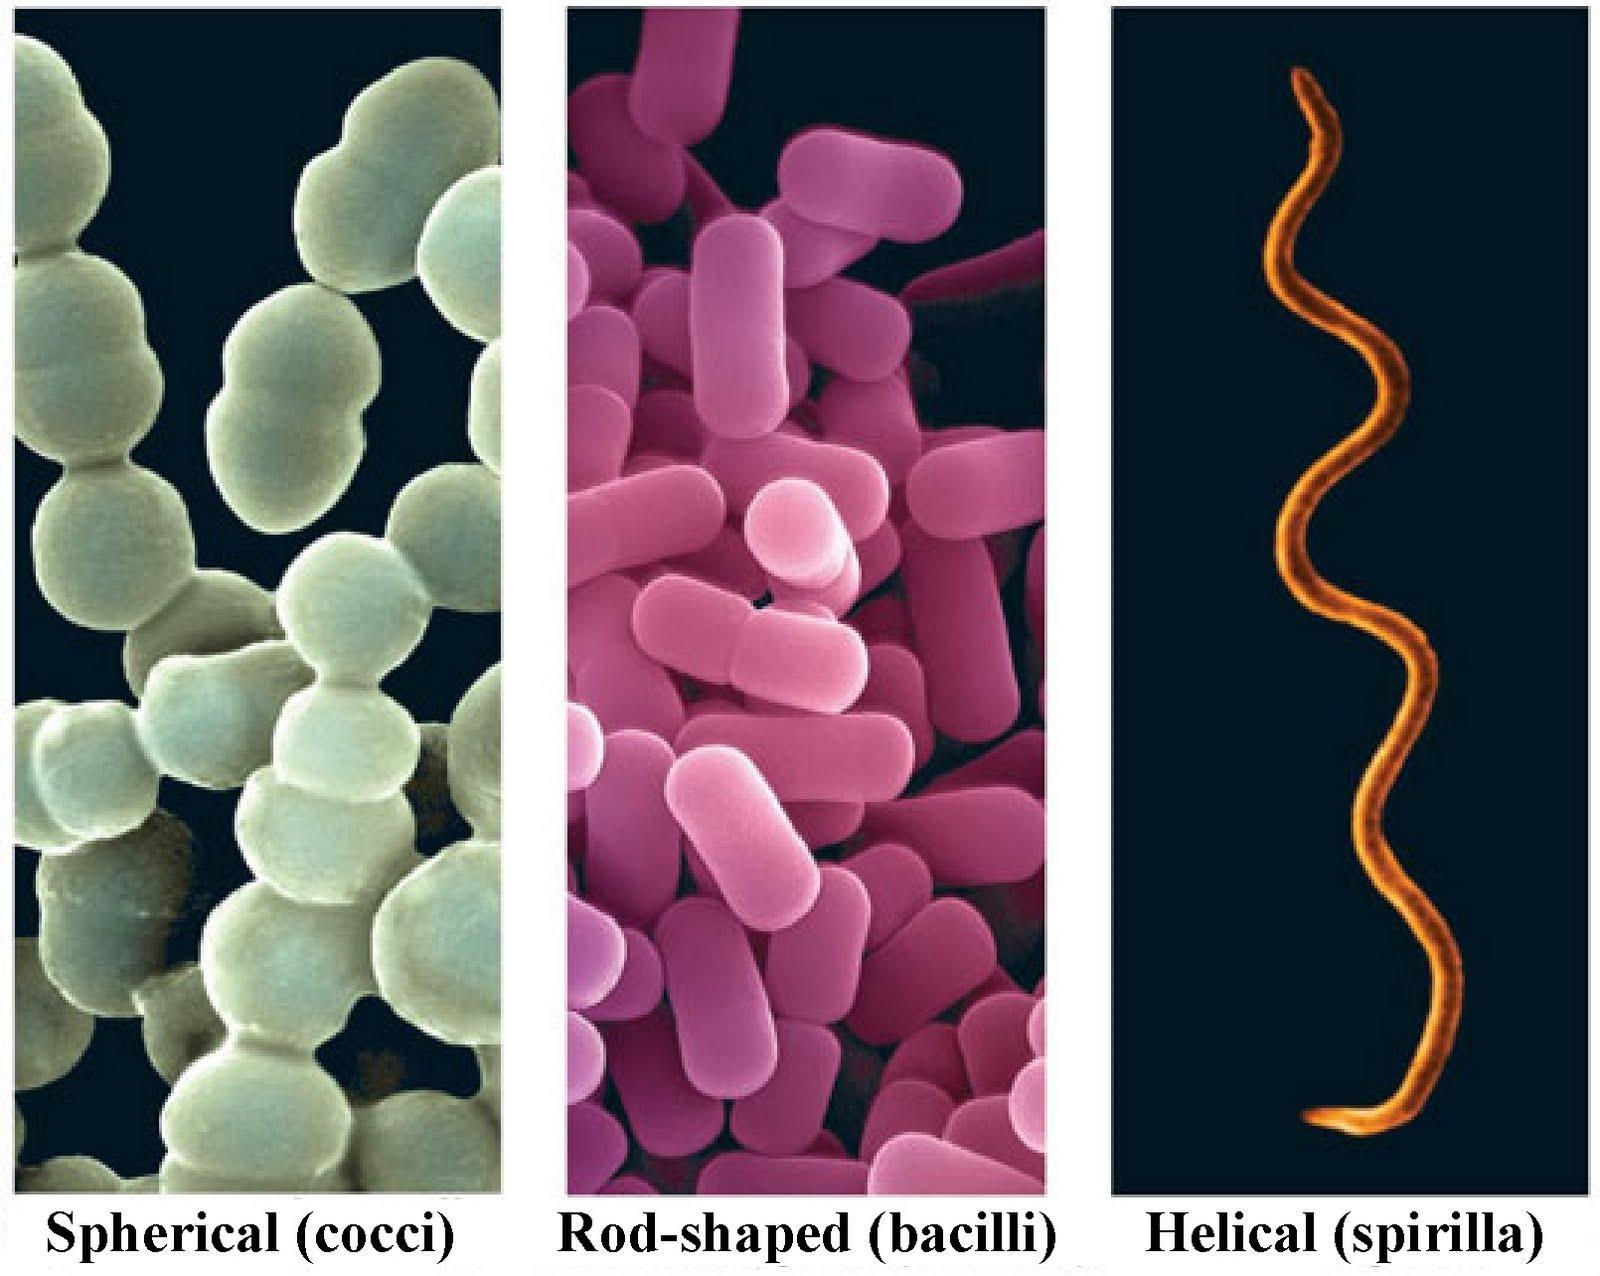 Pin By Anita Schwartz On Hs Biology